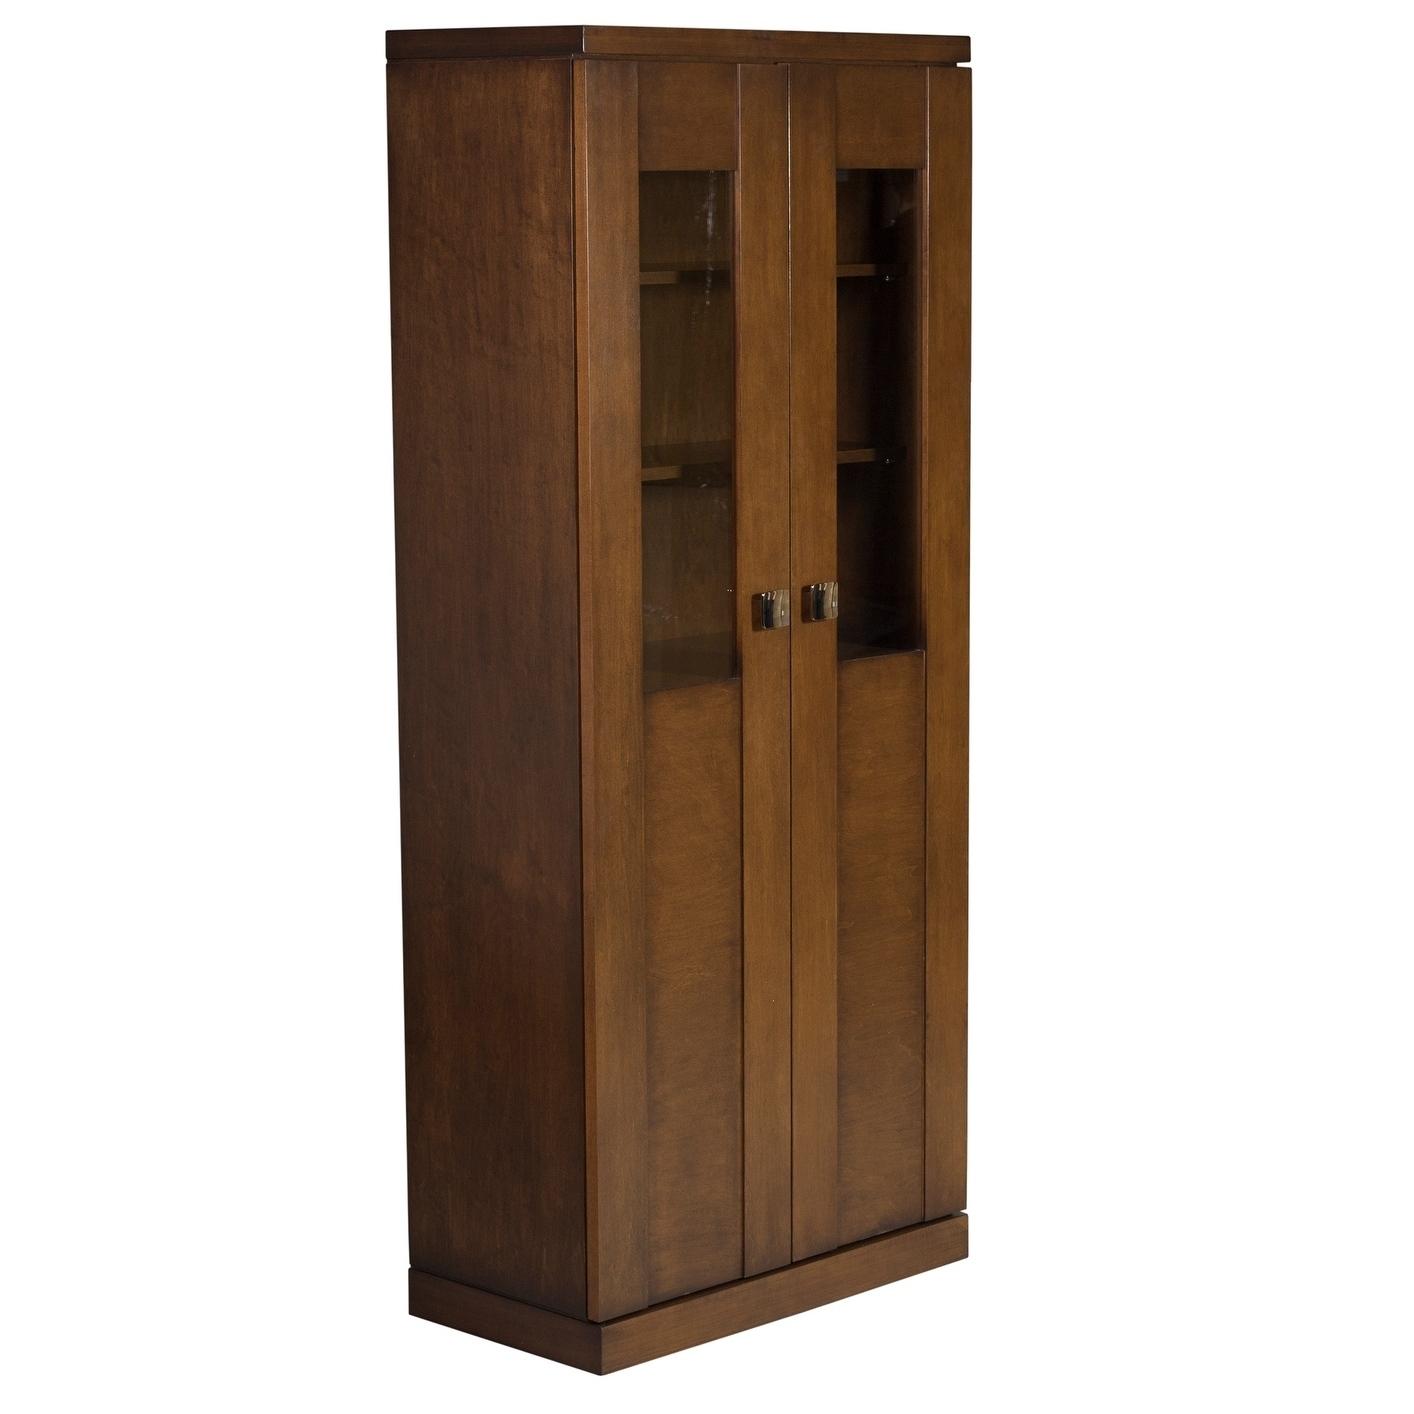 Saloom furniture 76 storage cabinet